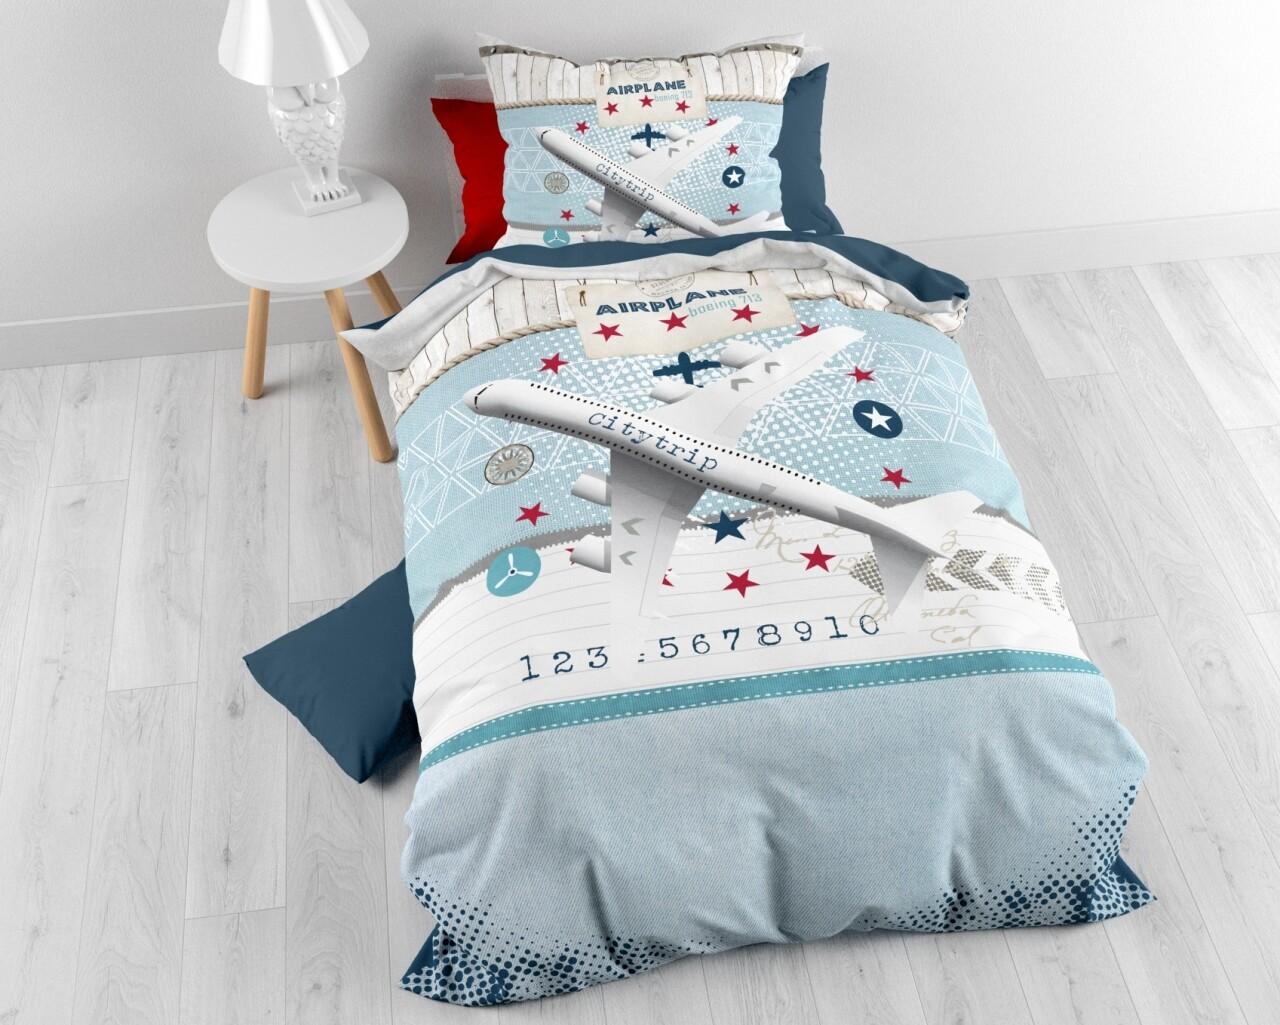 Lenjerie de pat pentru o persoana Airplane Blue, Royal Textile, 100% bumbac